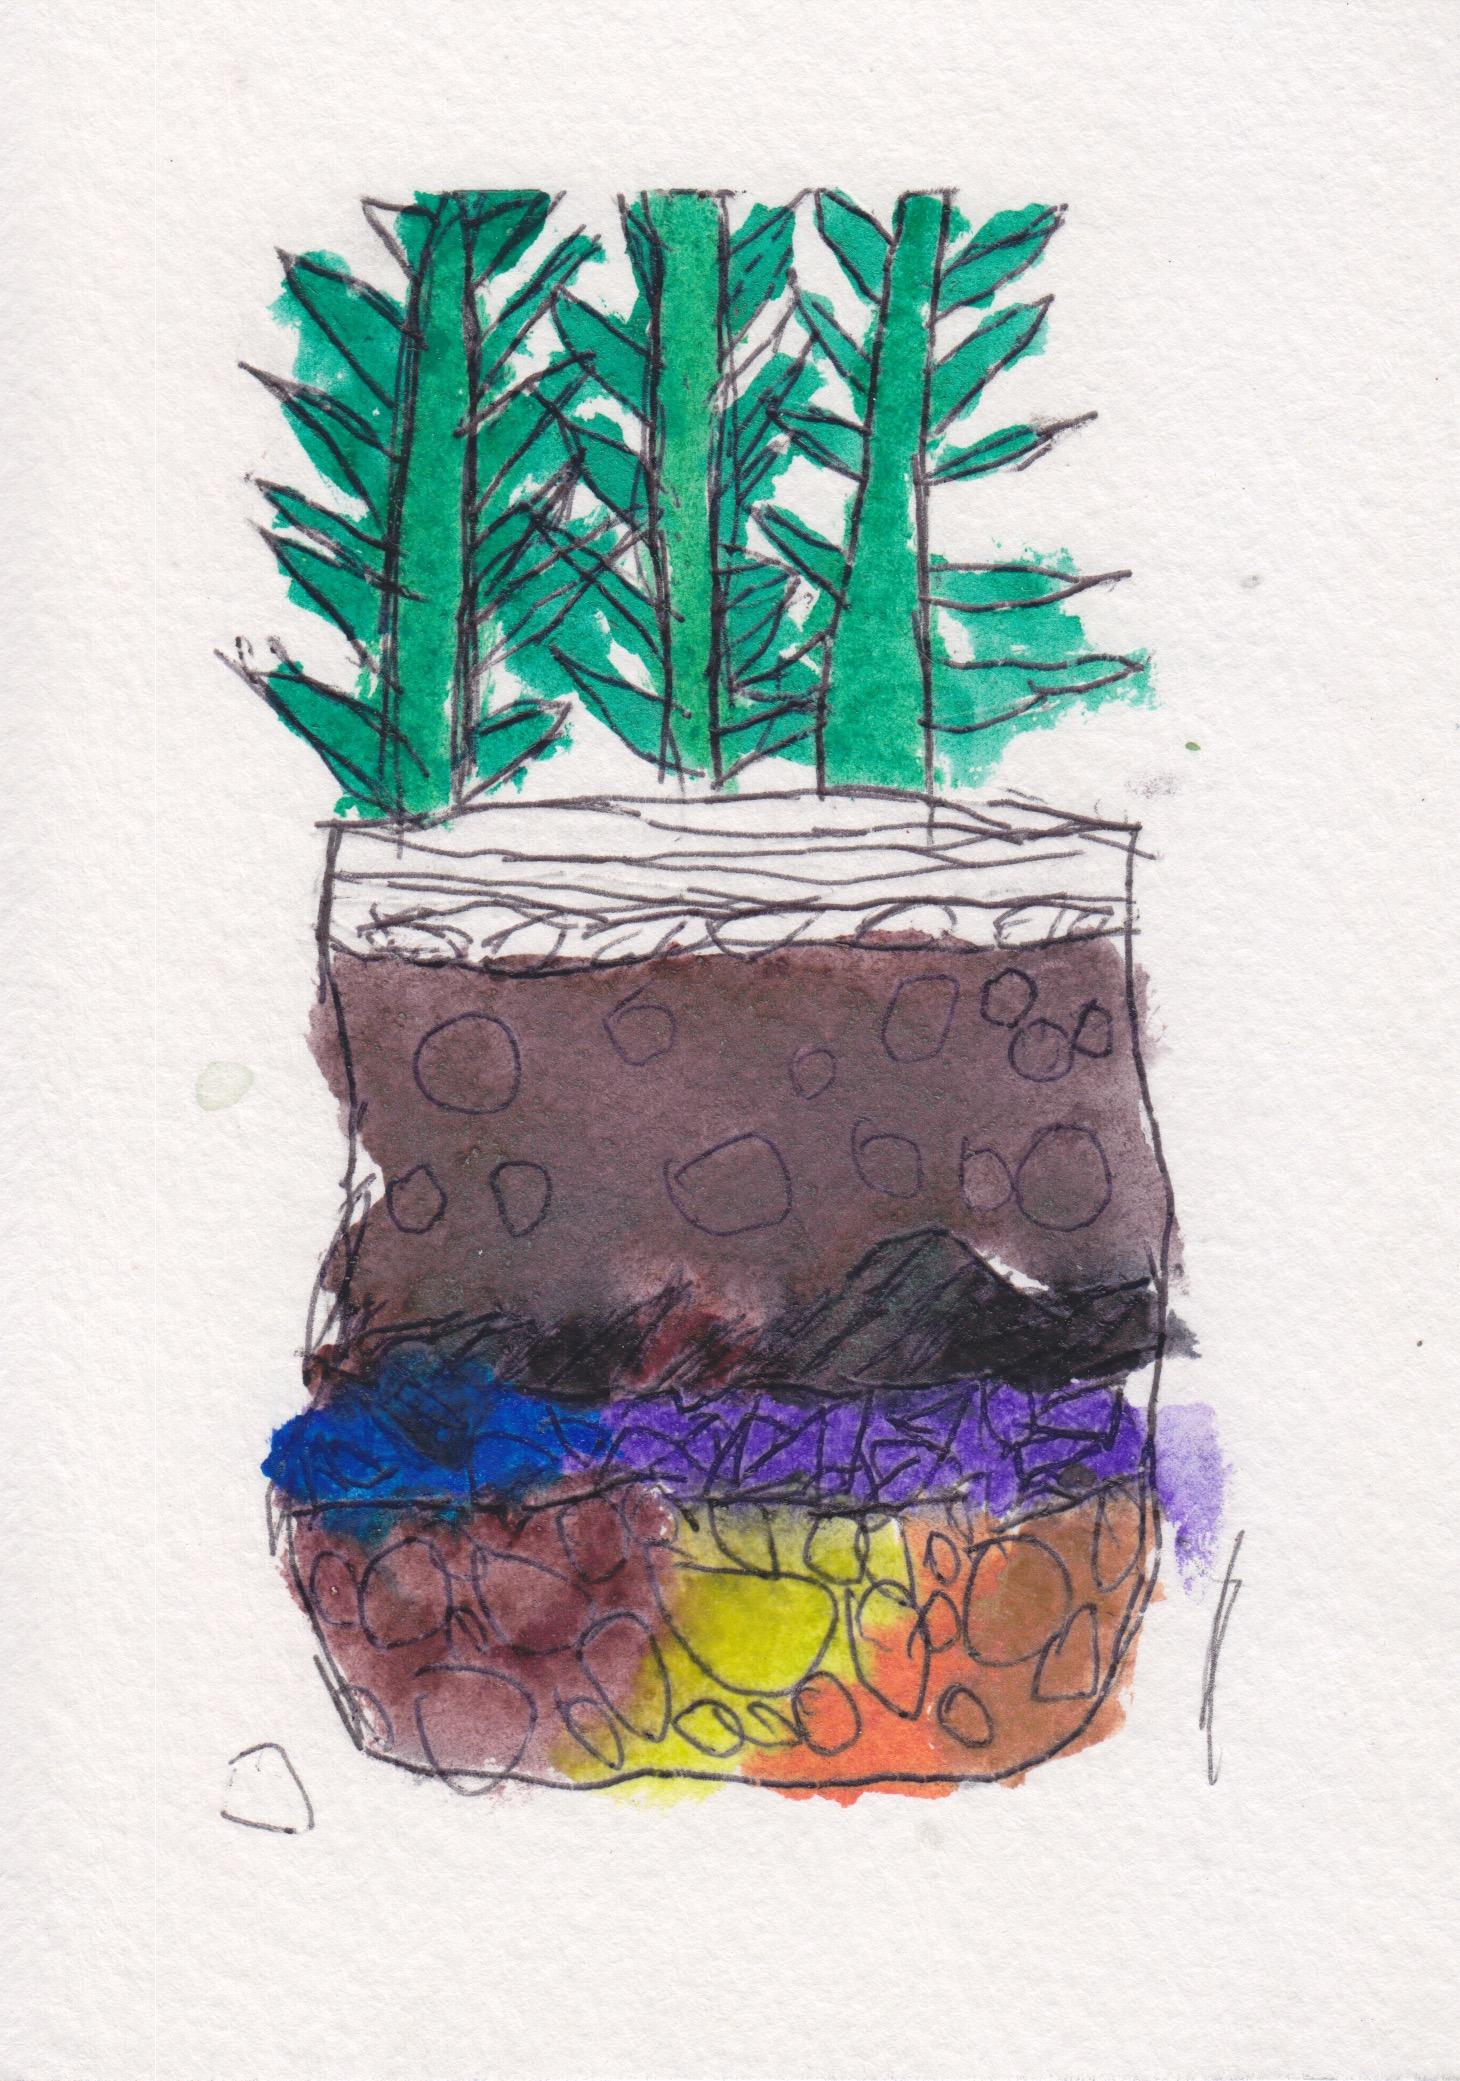 centro_watercolor terrarium_JulianPerez.jpeg